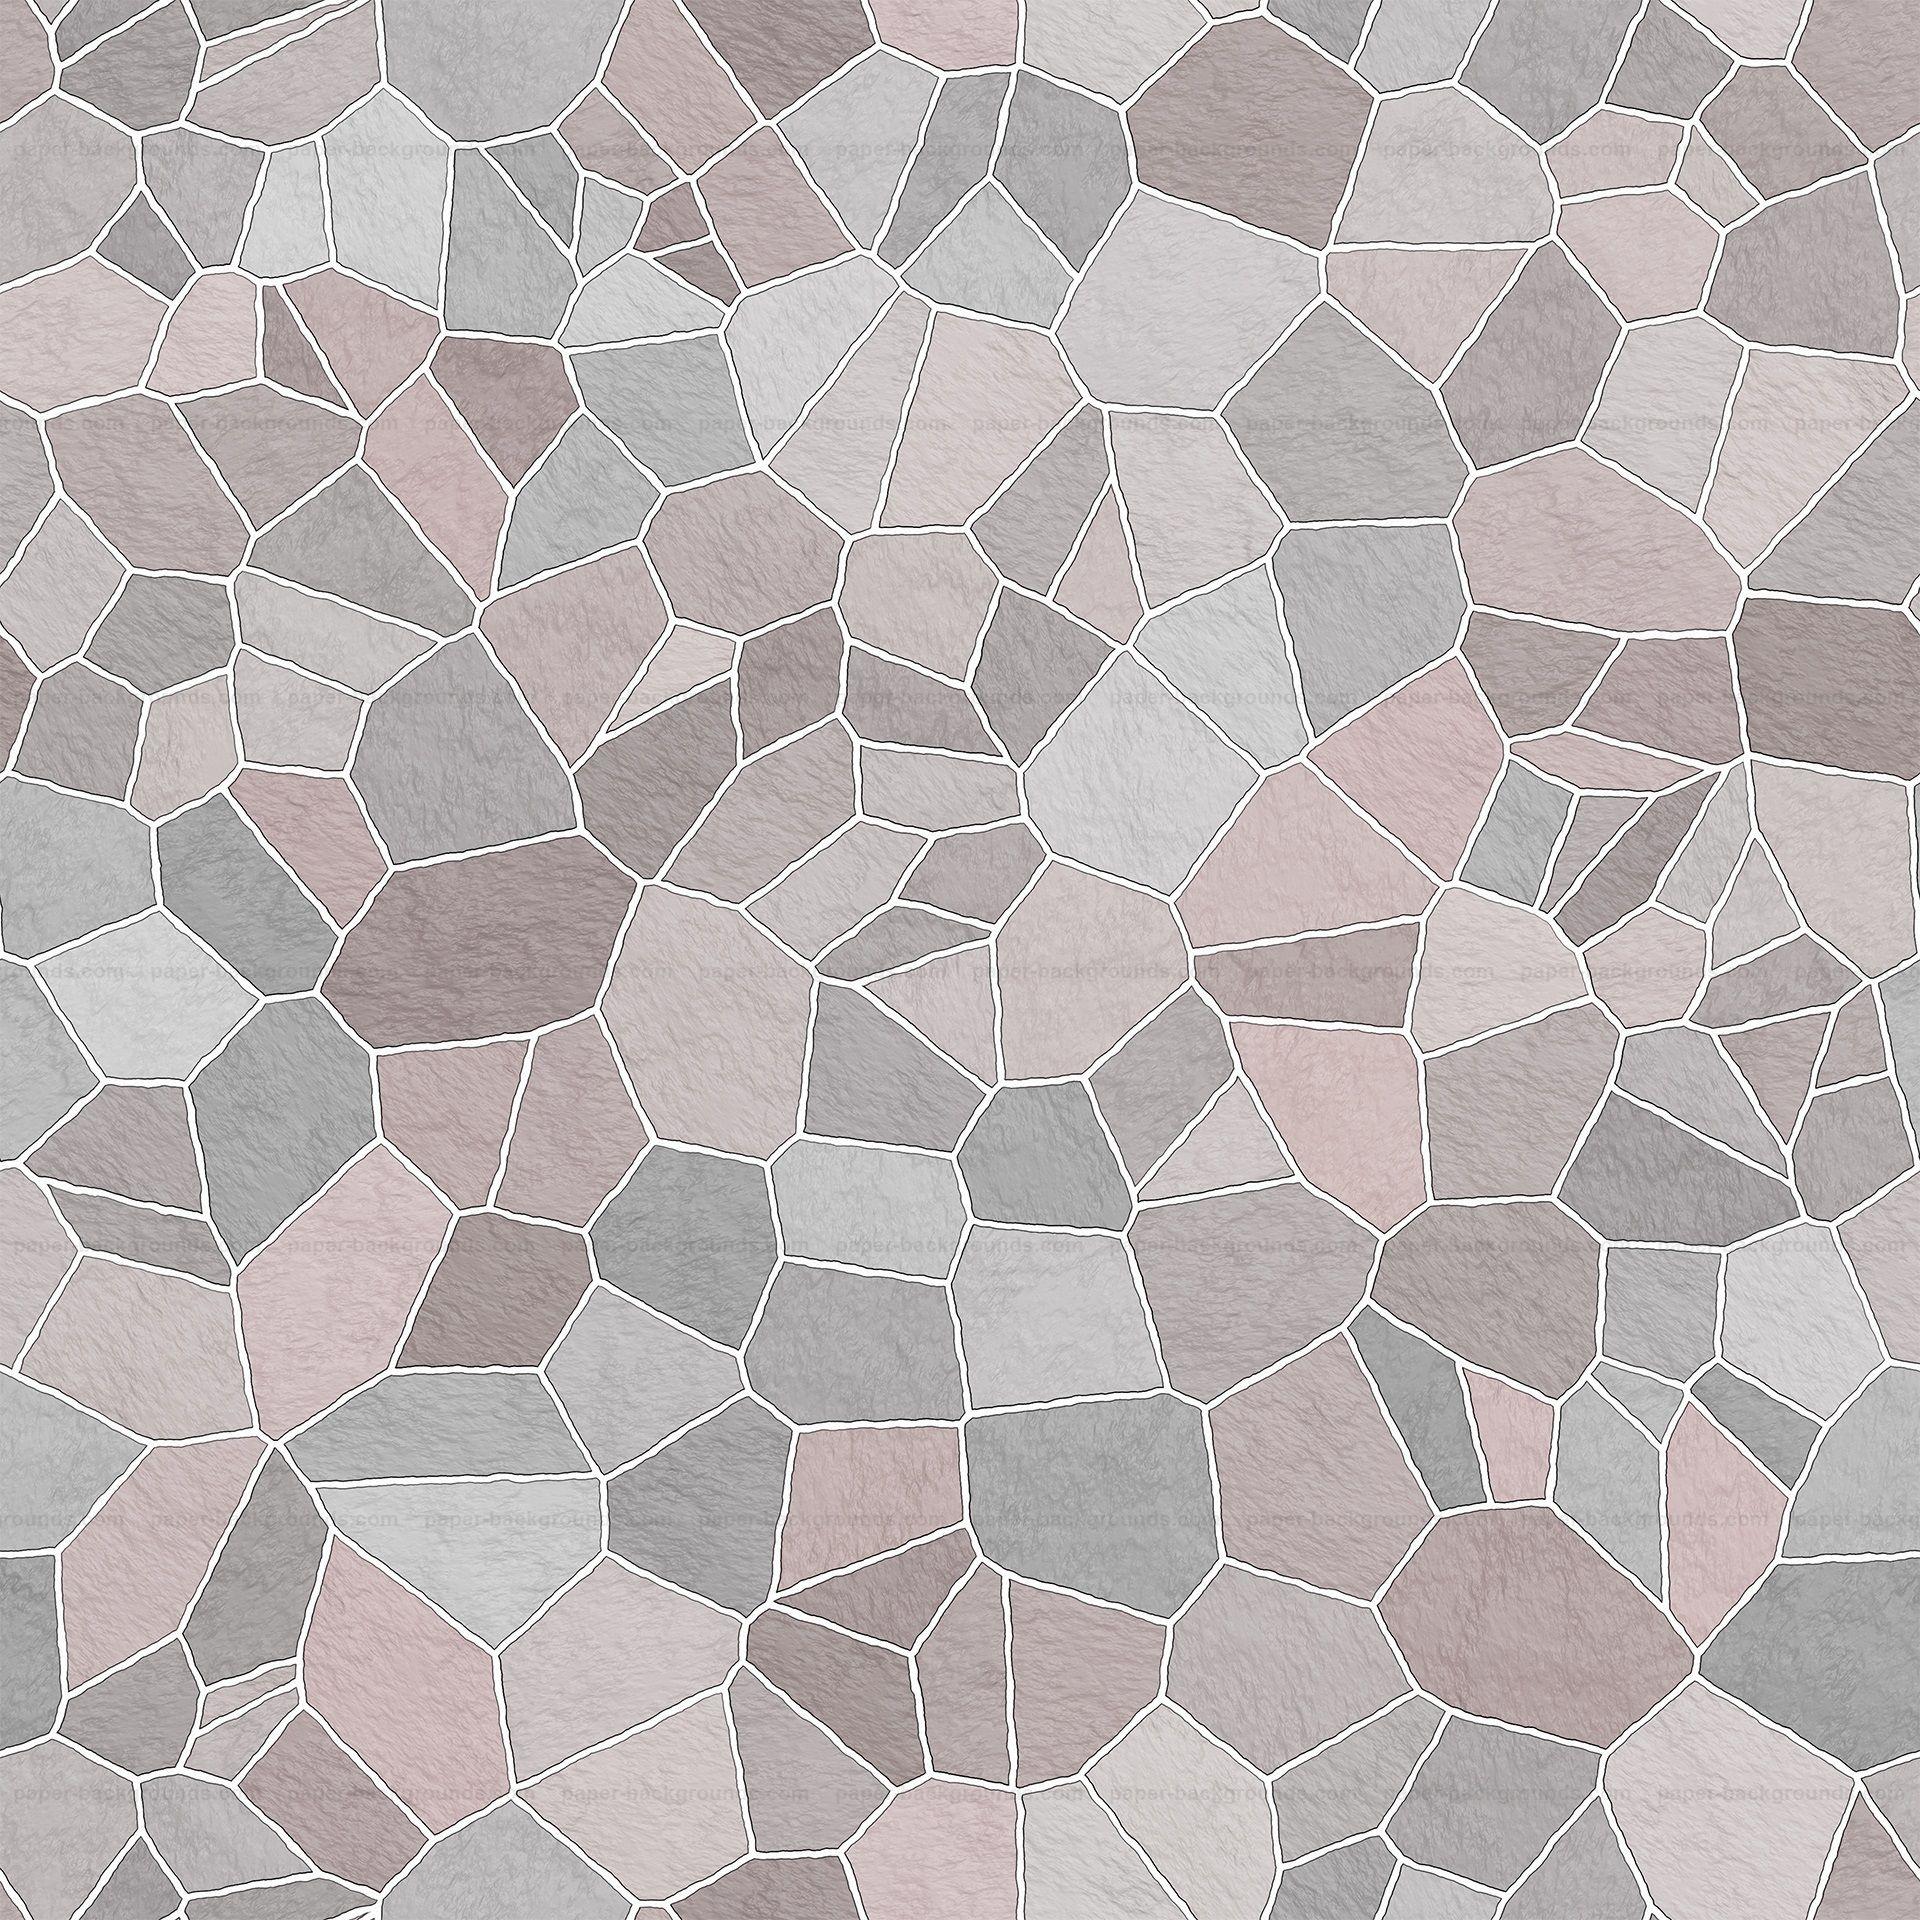 Patio Stone Background Seamless Pale Stone Patio Wall